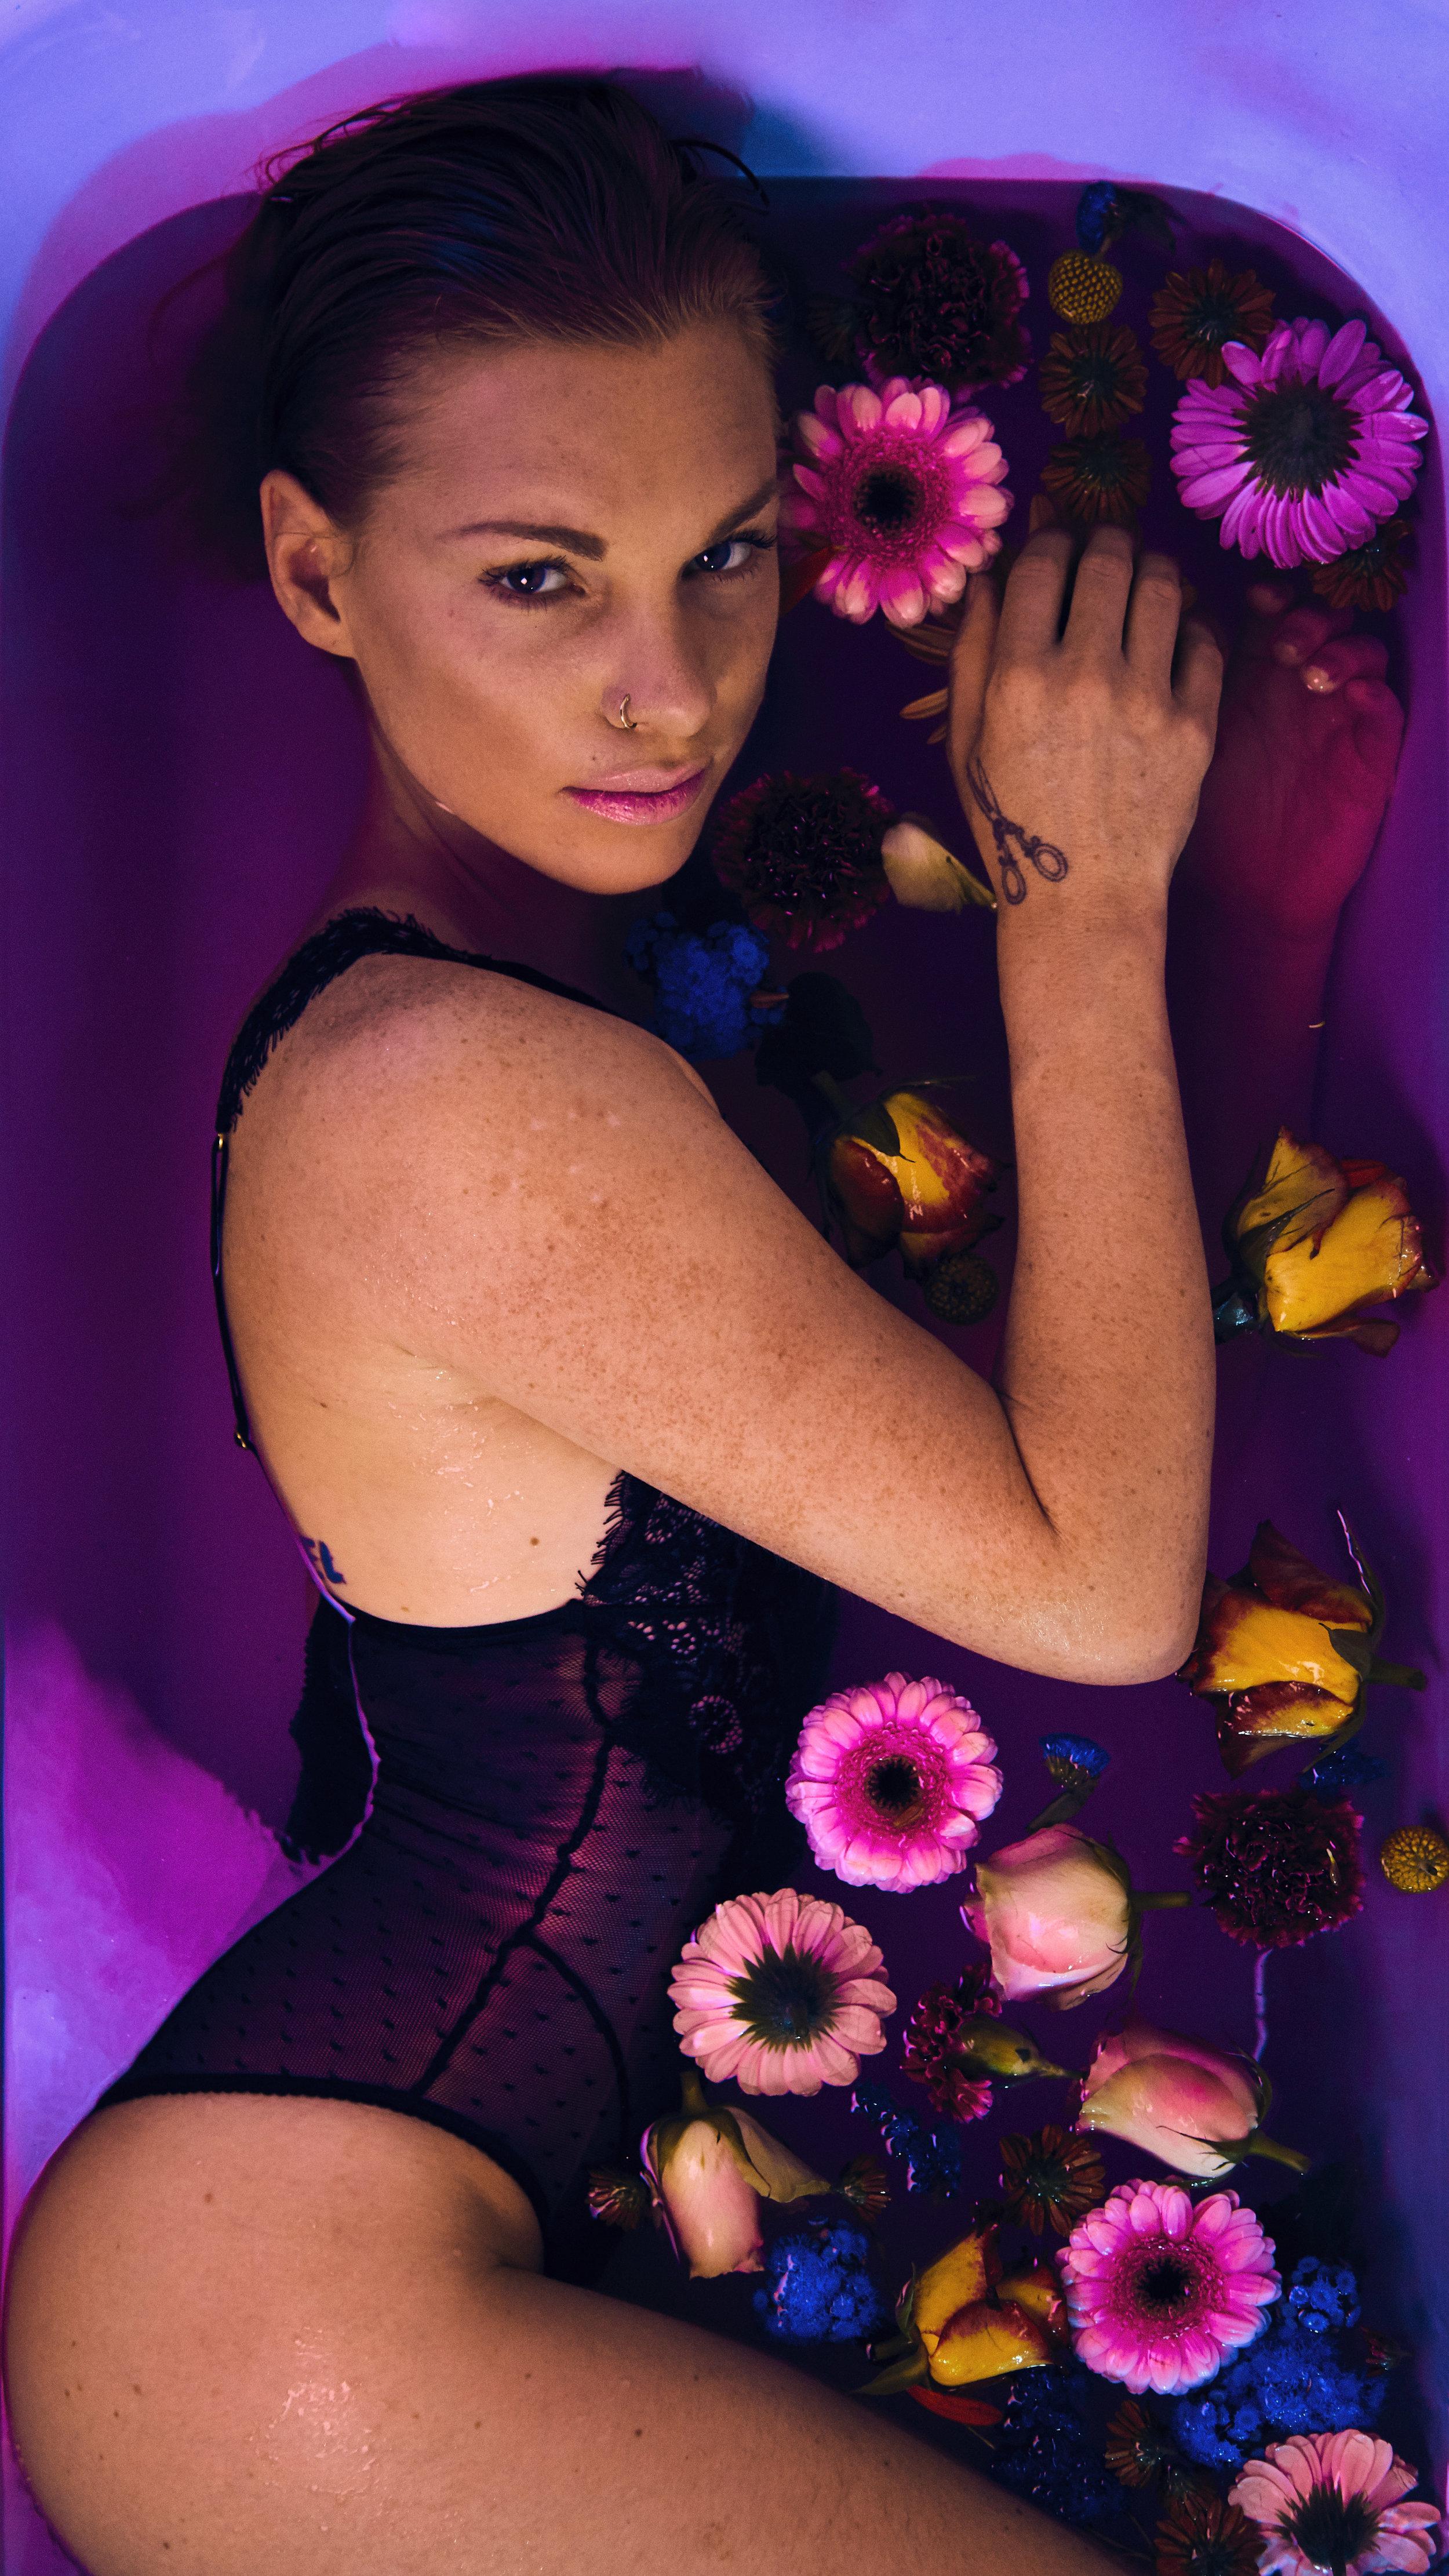 18-11-07-Shoot Judith Siemons-IMG_0596_JPEG Quality 80_C1.jpg